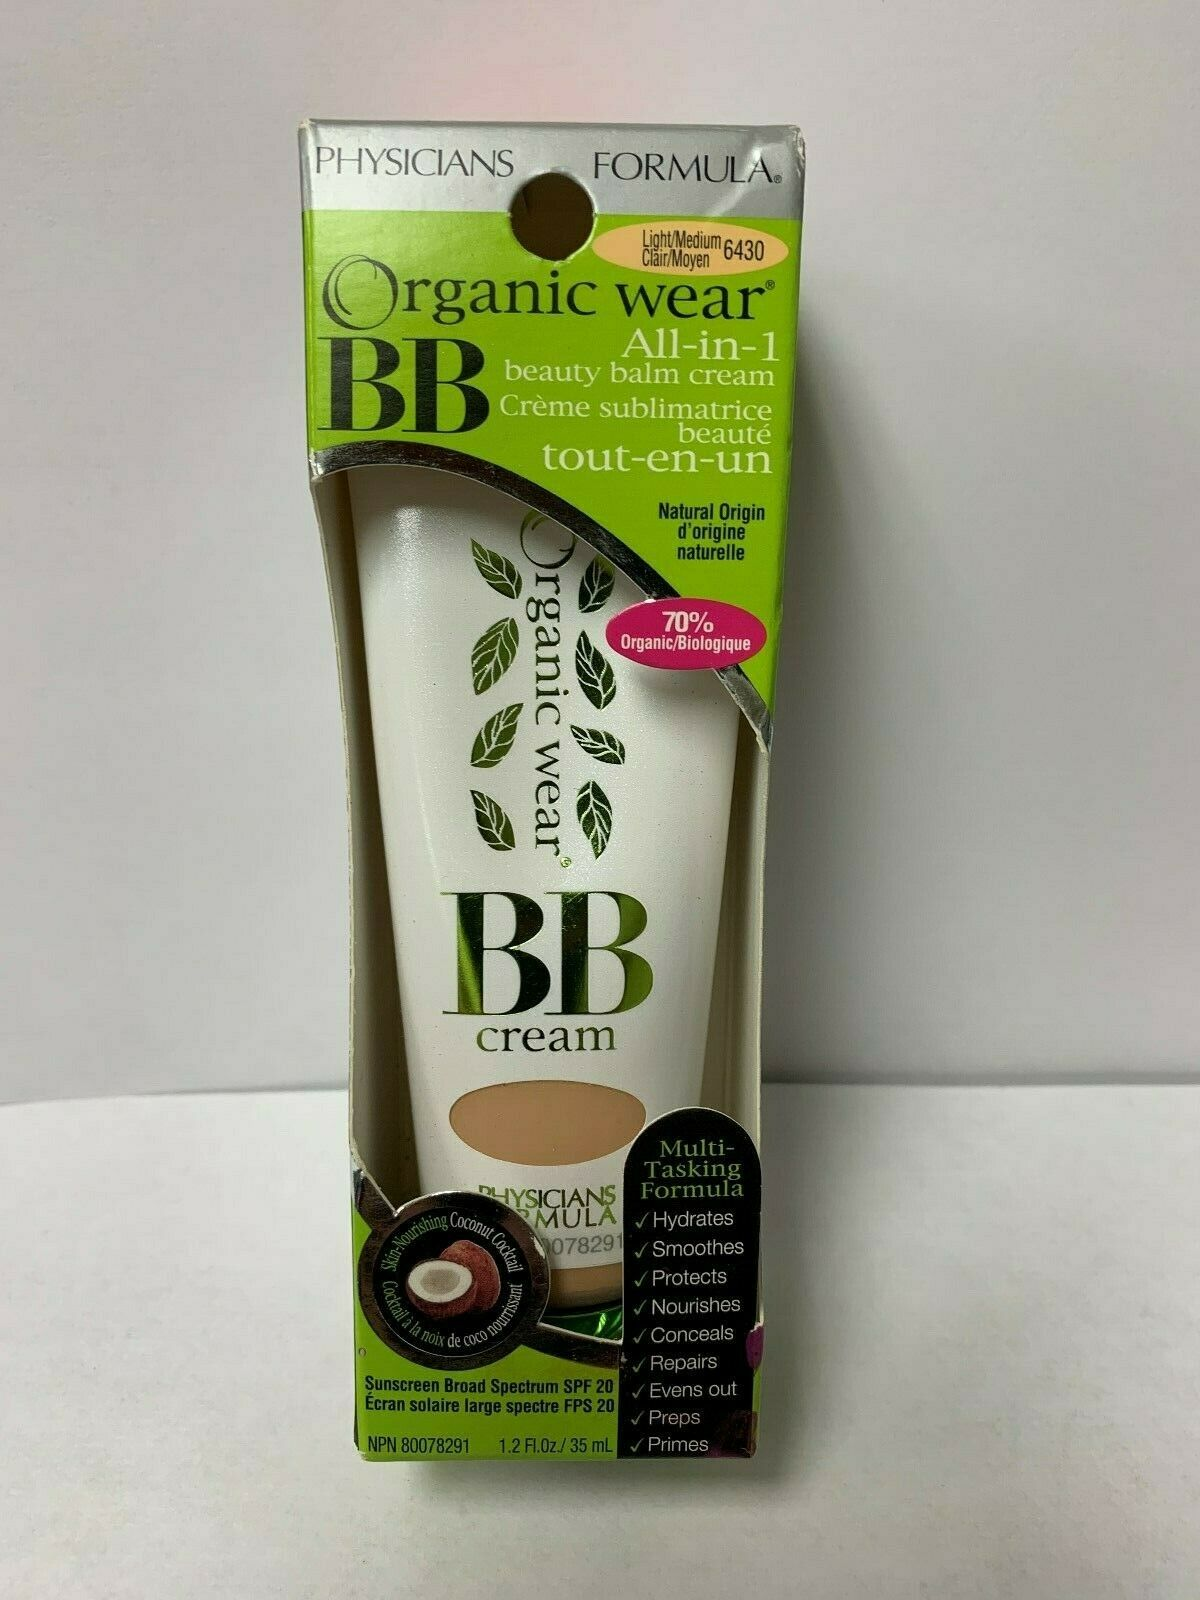 Physicians Formula Organic Wear All-in-1 Beauty Balm Cream,